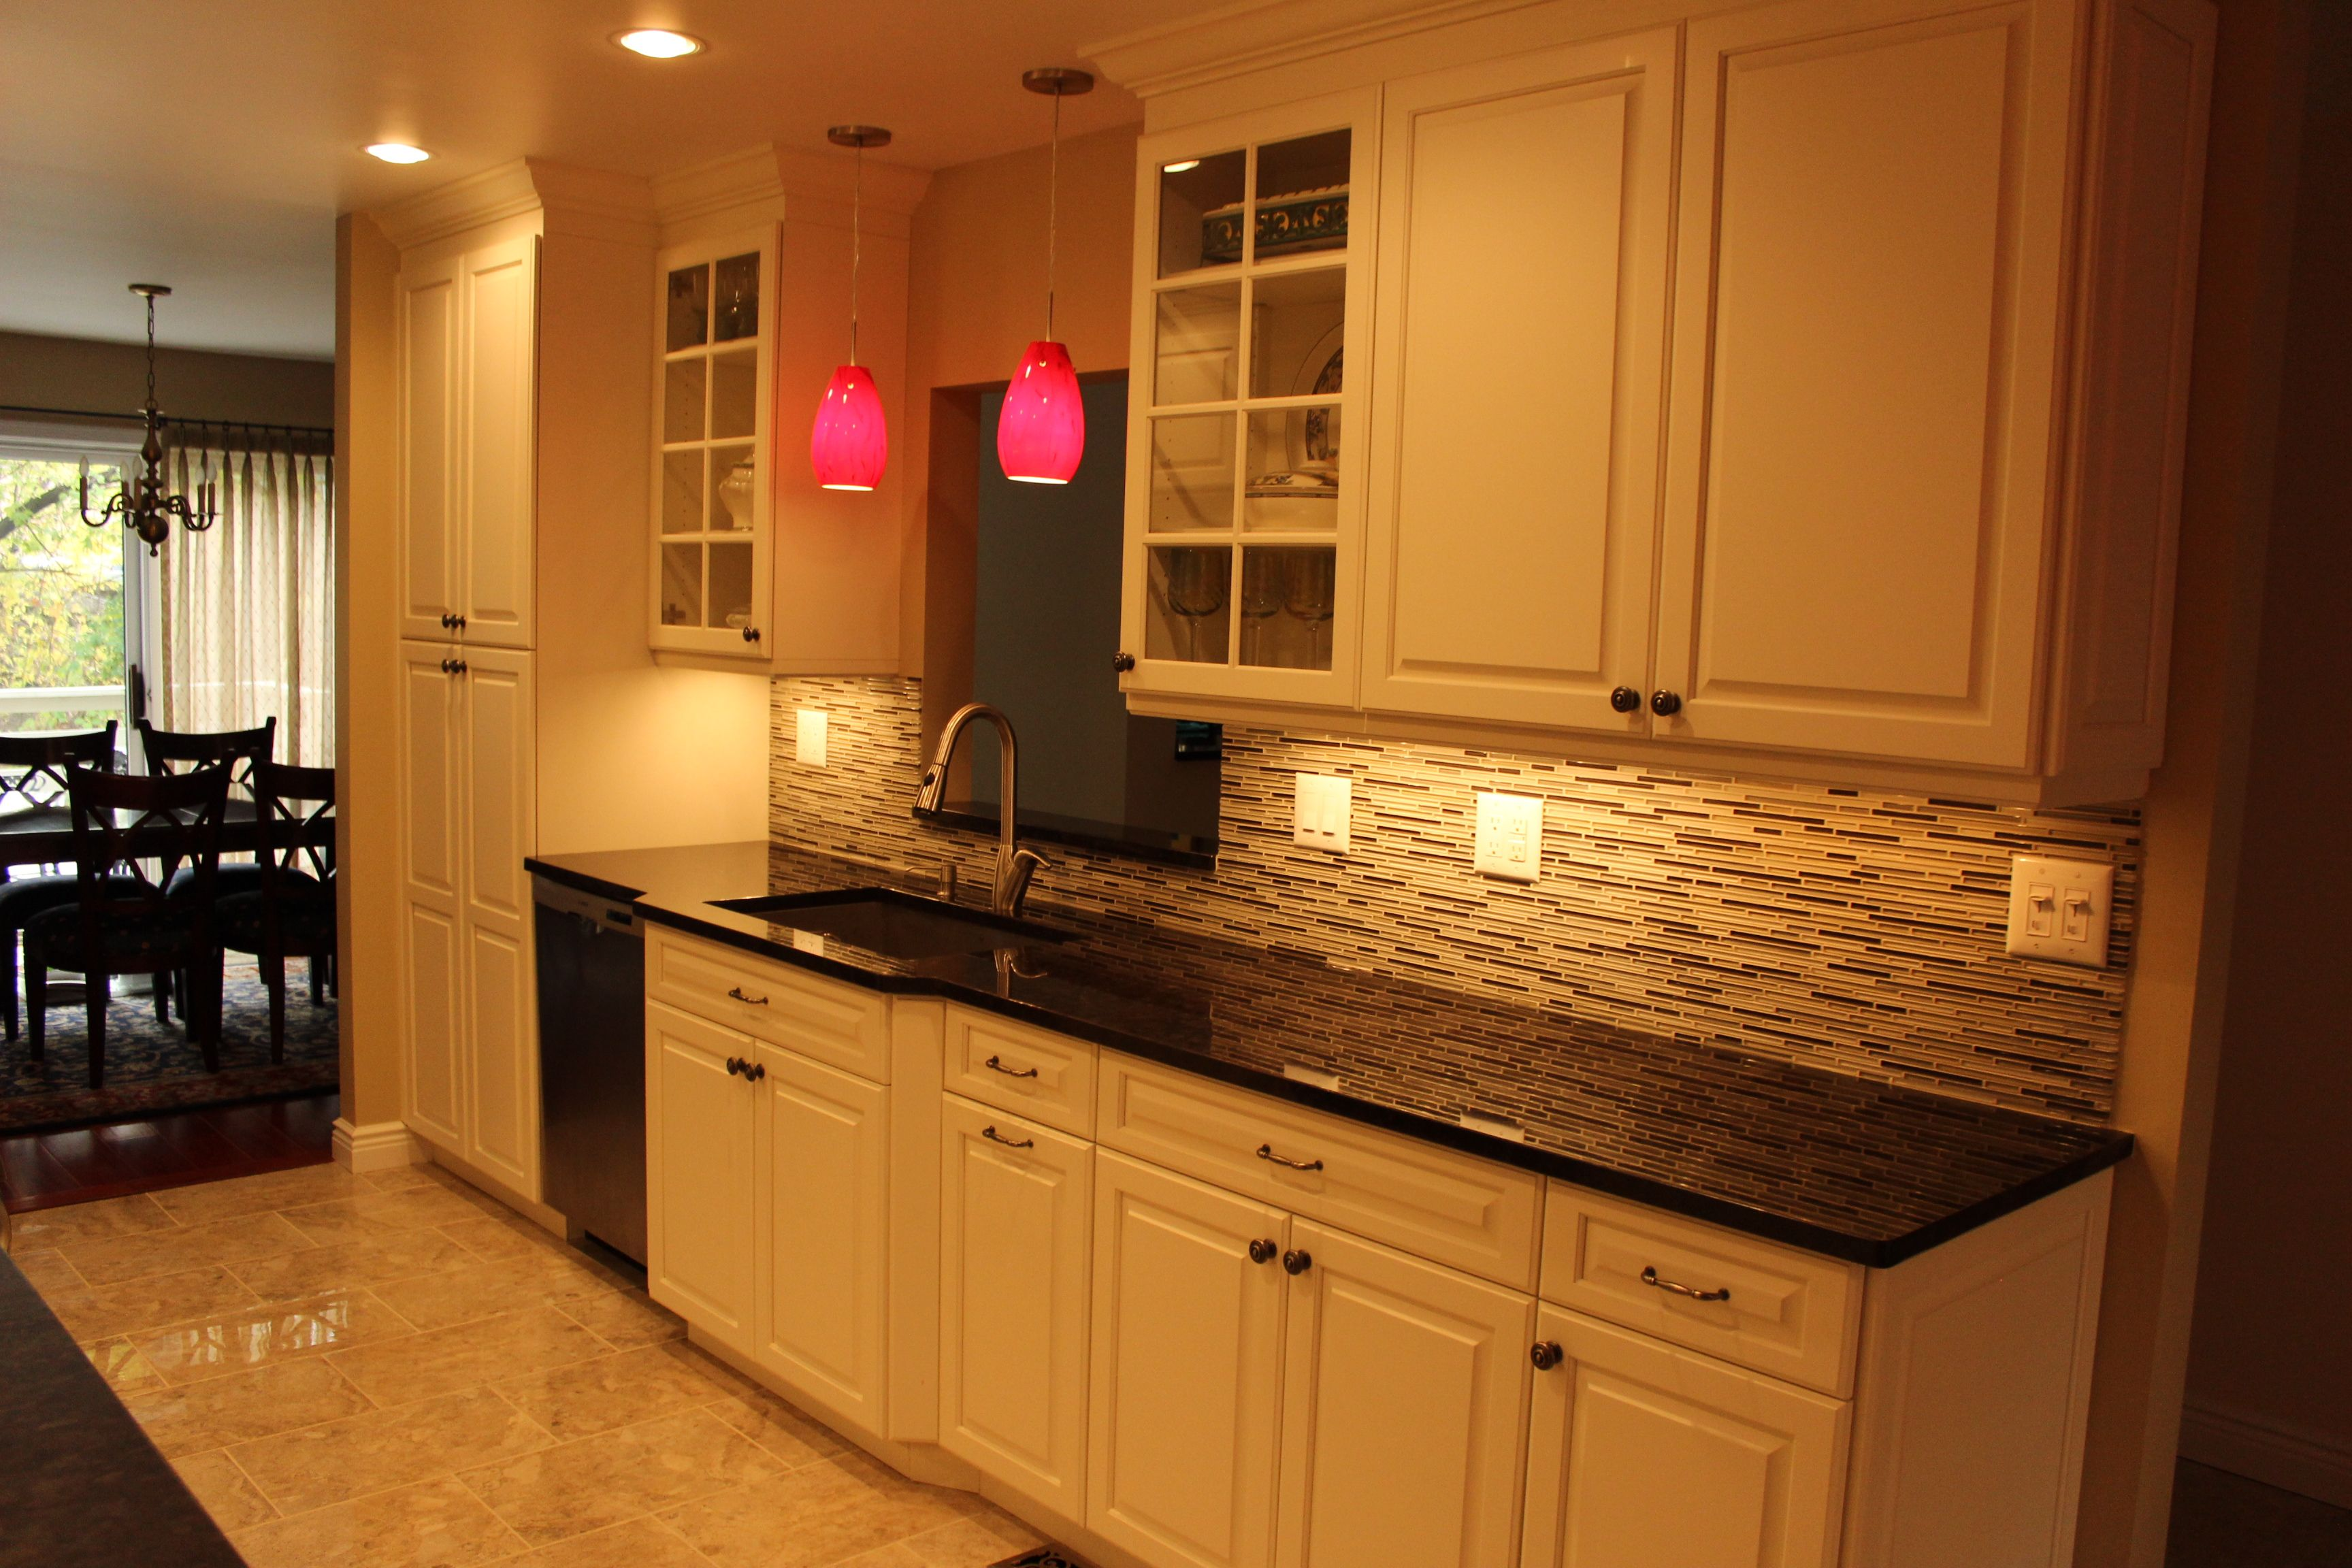 Designer Jodi Duerr Plain & Fancy Vintage Maple Cabinetry in dove low sheen paint Countertop Marron Cohiba Granite Backsplash Tile ADKO Heavy